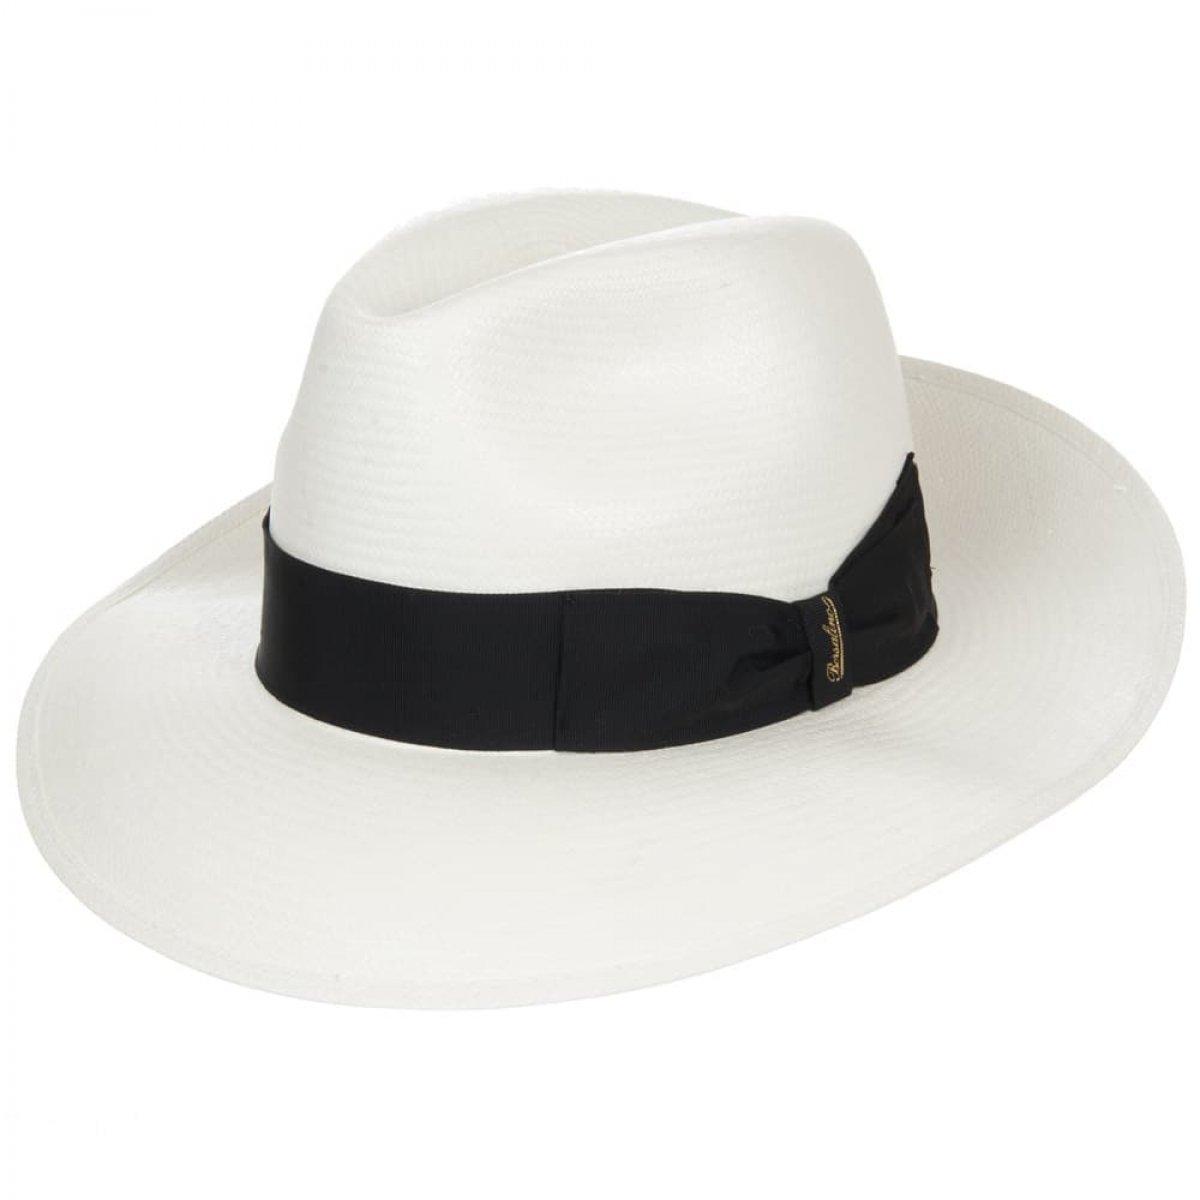 Larga BorsalinoA Tesa Bianco Panama Cappello In MpqzUVSGL